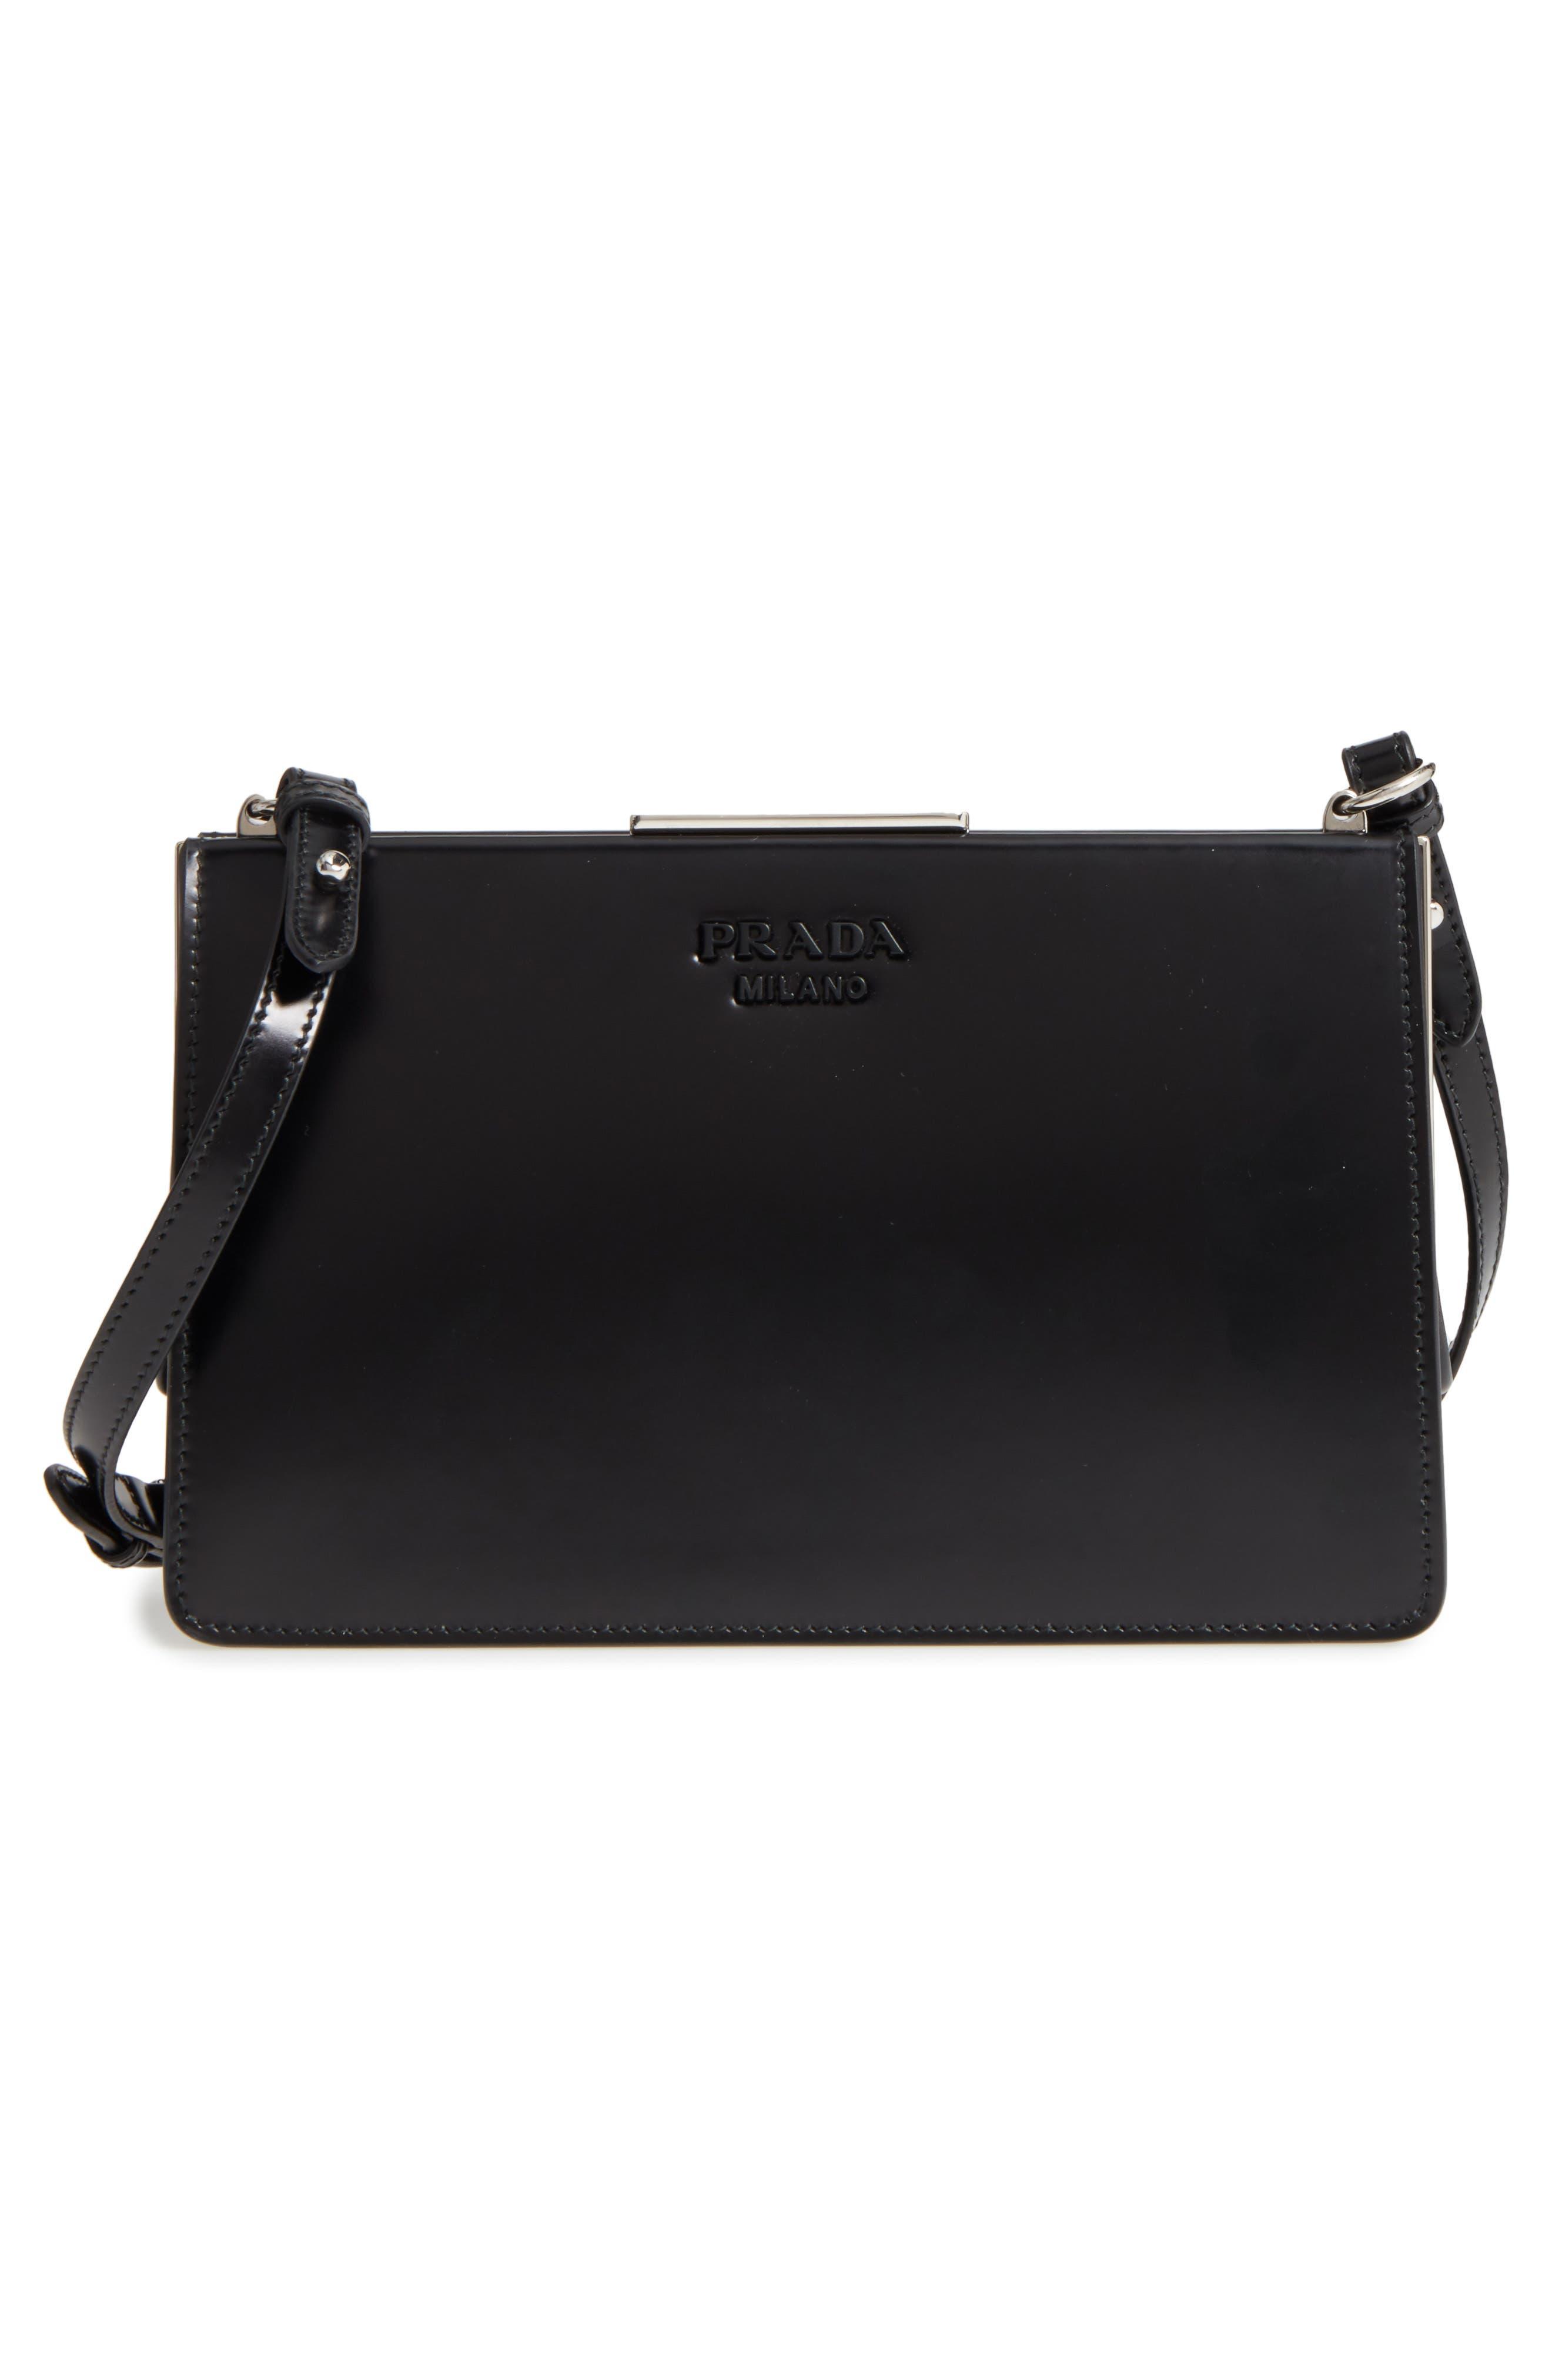 PRADA,                             Spazzolato Calfskin Crossbody Bag,                             Alternate thumbnail 3, color,                             001